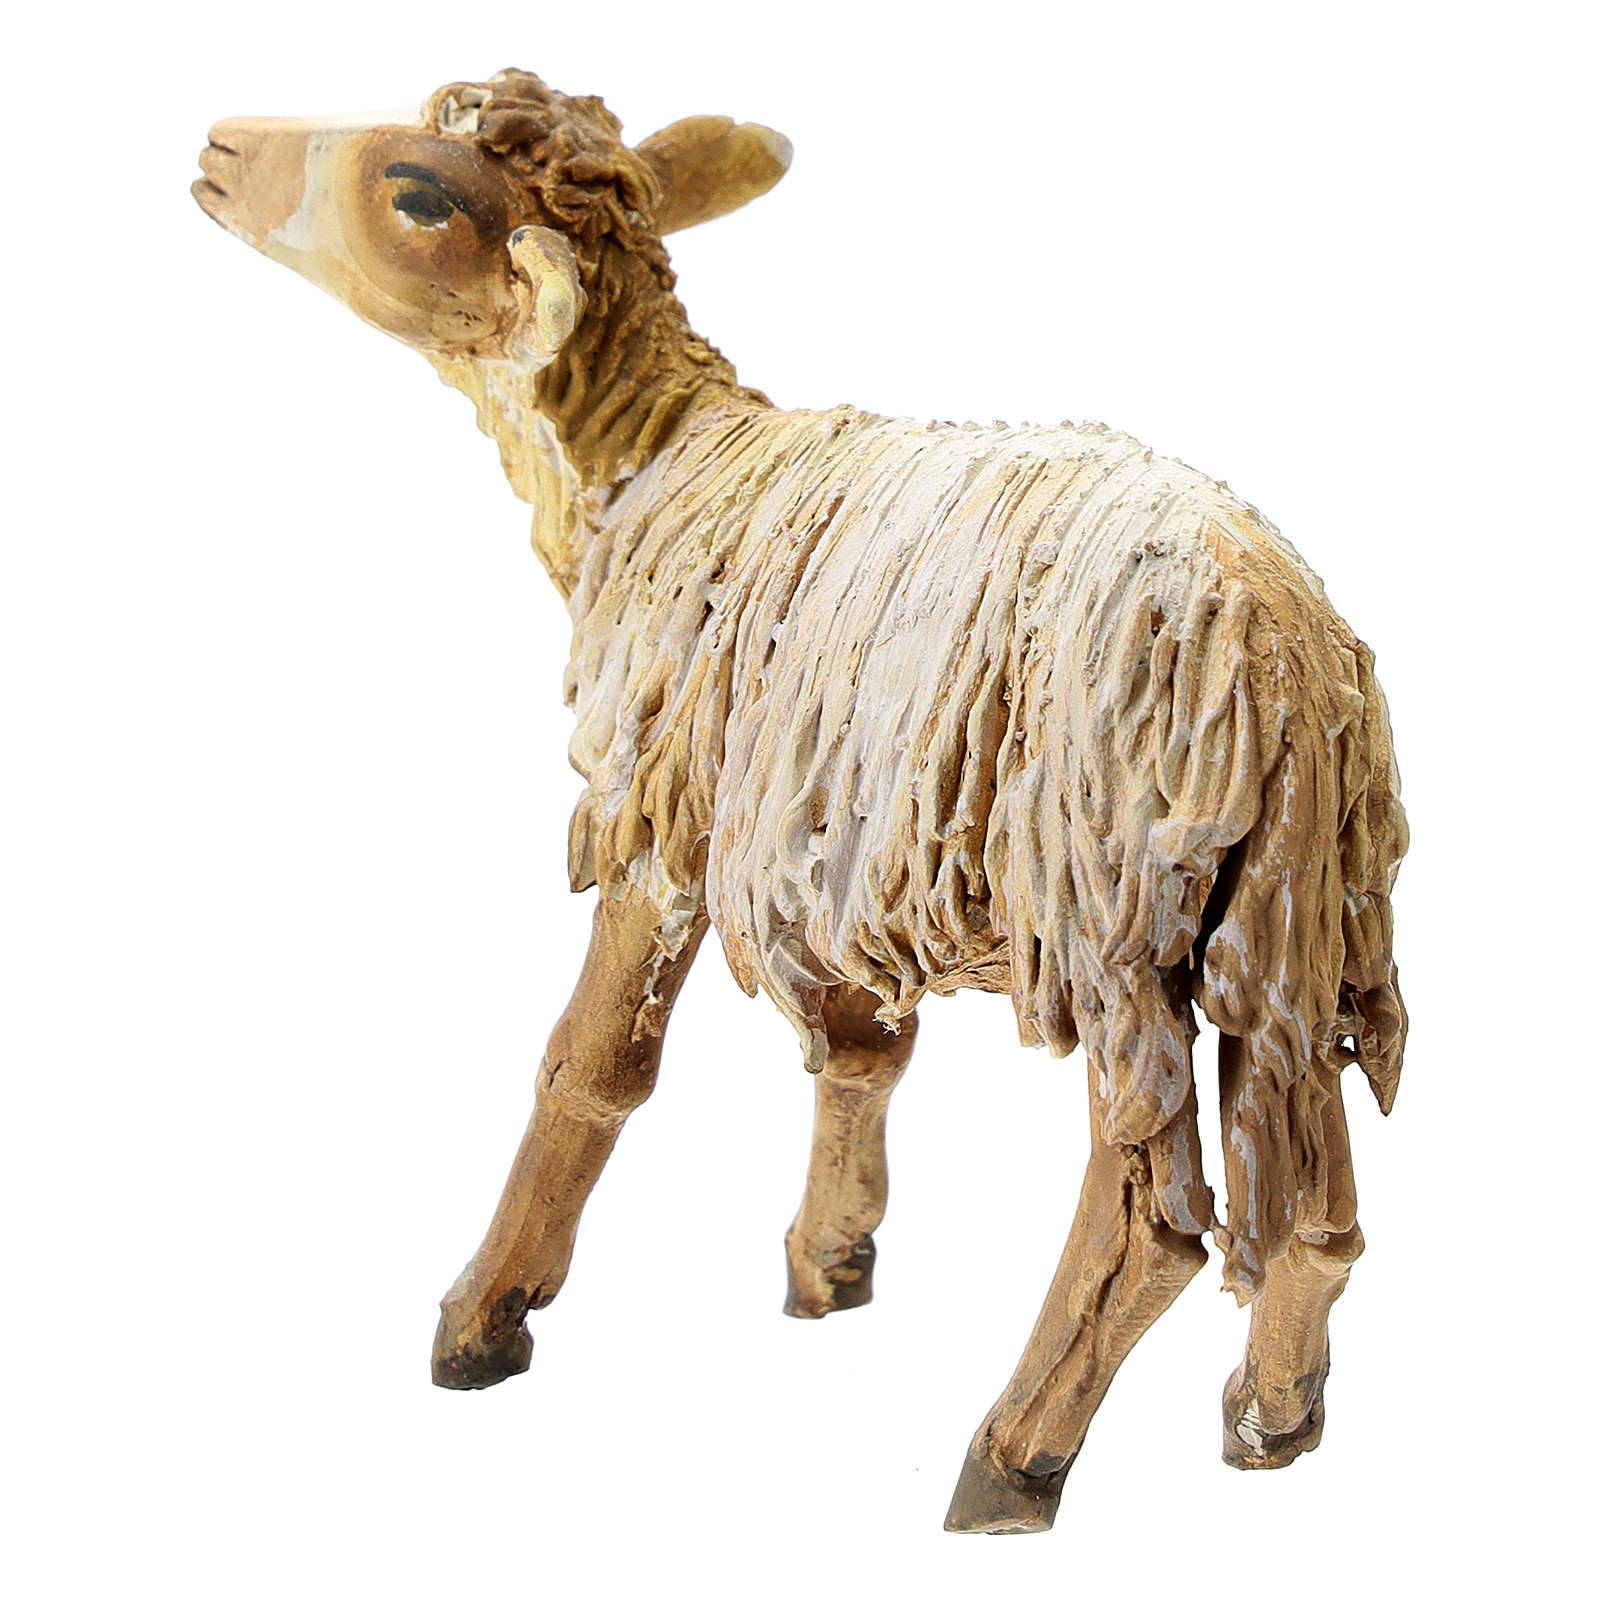 Nativity scene figurine, Sheep looking up by Angela Tripi 13 cm 4